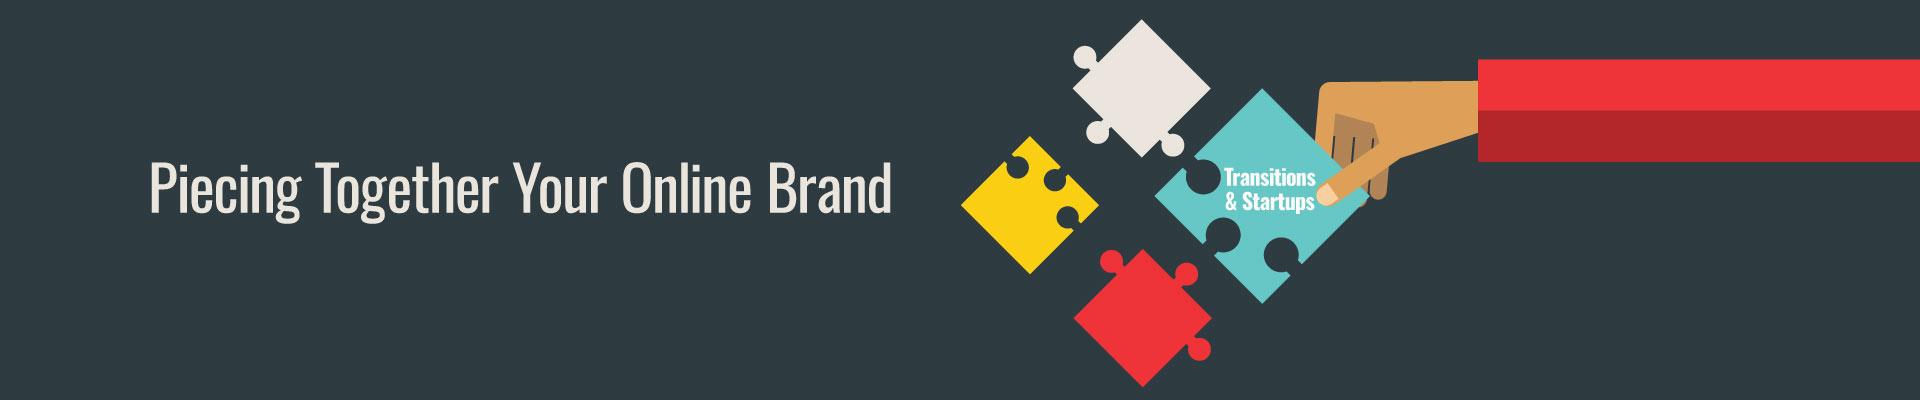 Online Brand Transitions Orthopreneur Internet Marketing